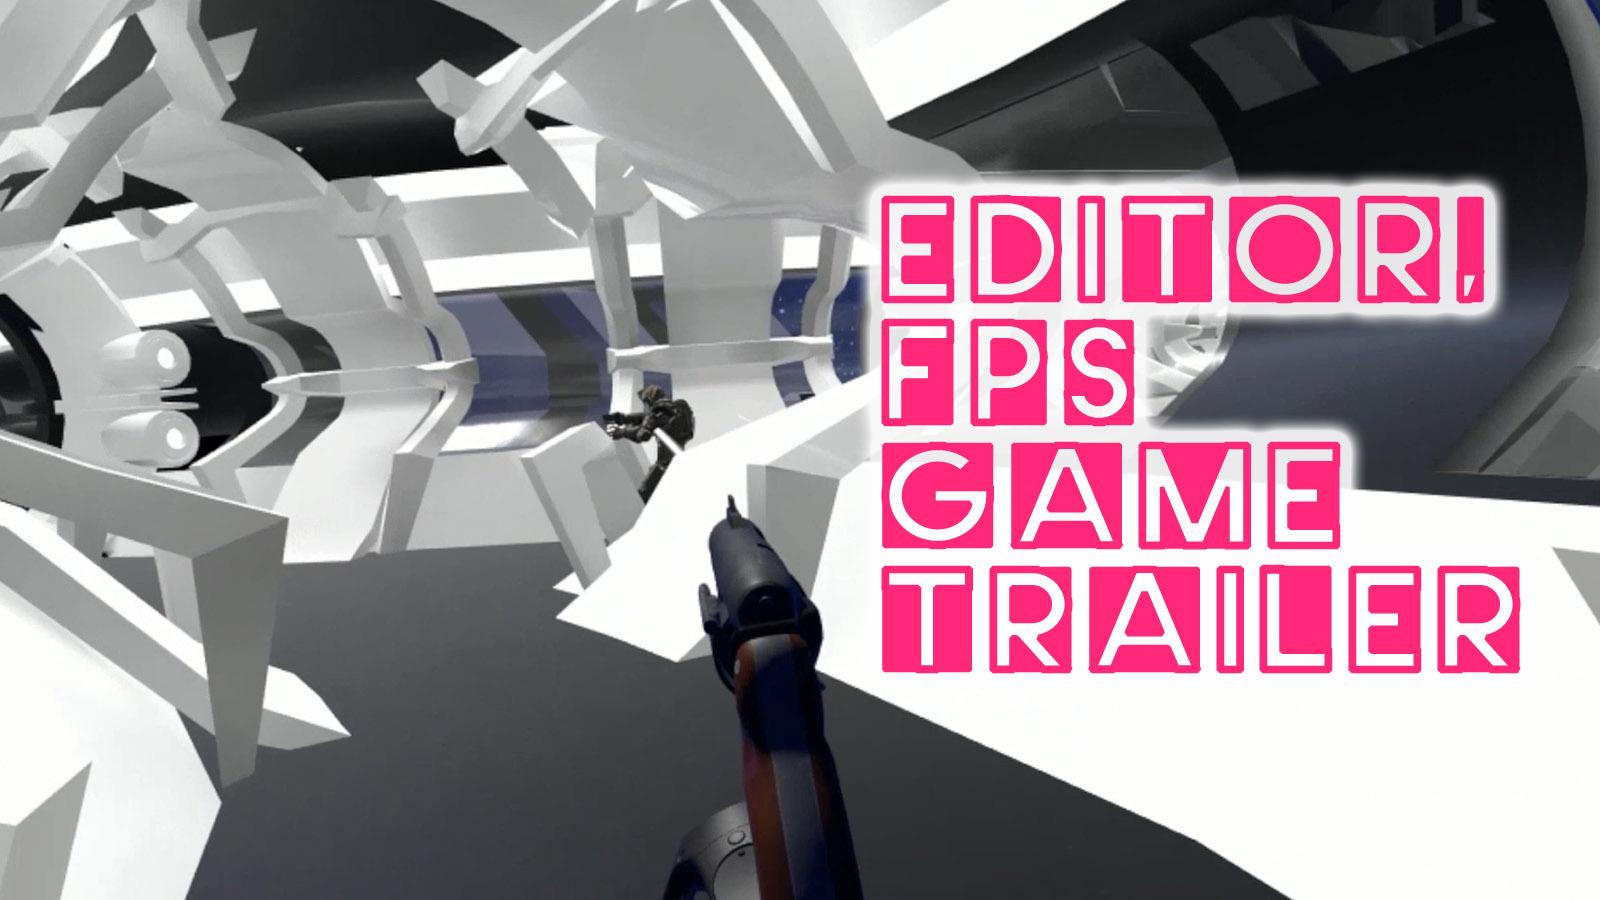 FPS Game Trailer Editor